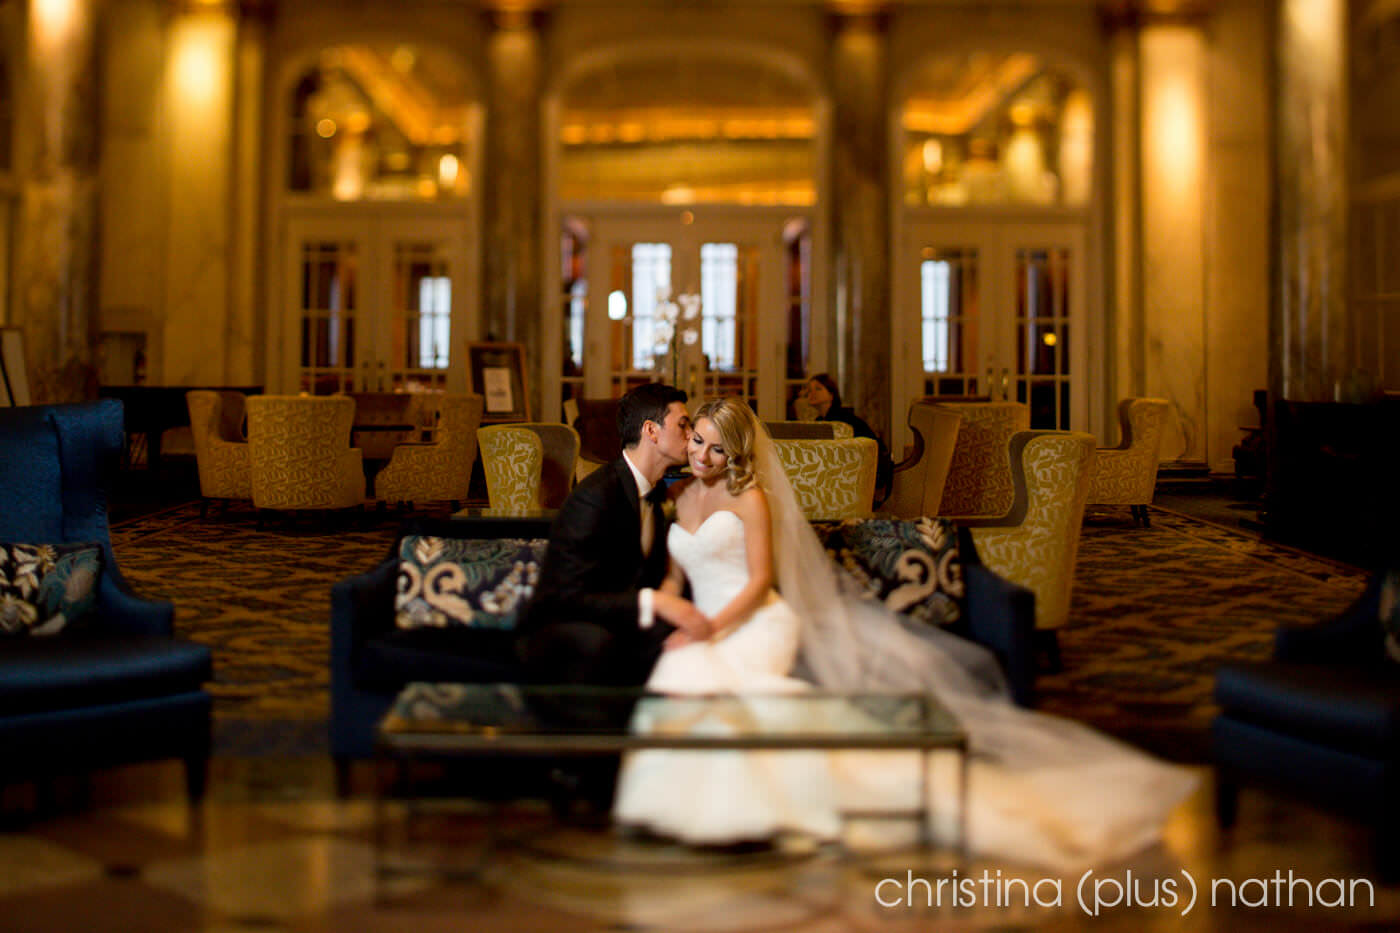 Palliser hotel wedding photos